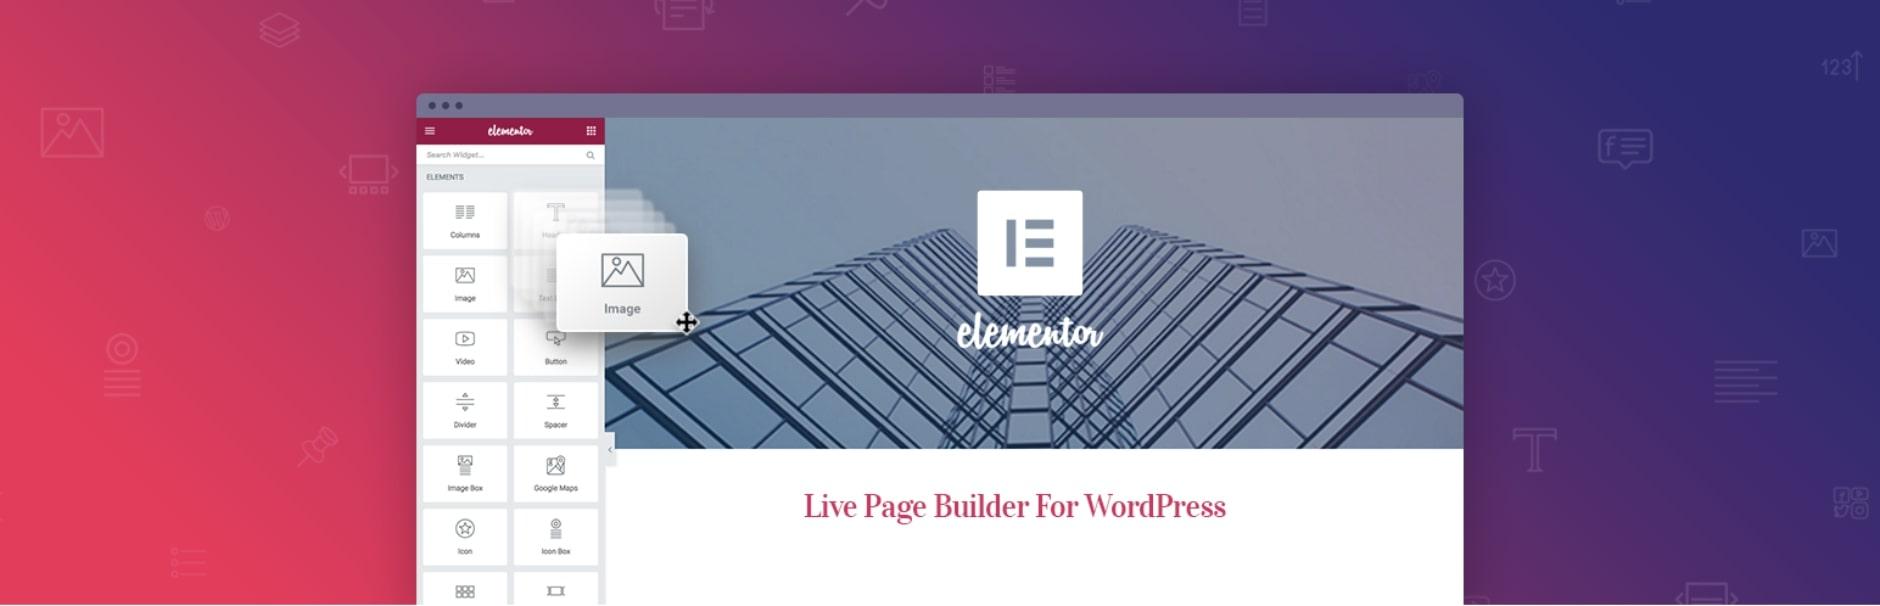 Daftar 15 Plugin Wordpress Wajib Ada di Blog untuk SEO (Edisi 2019) 9